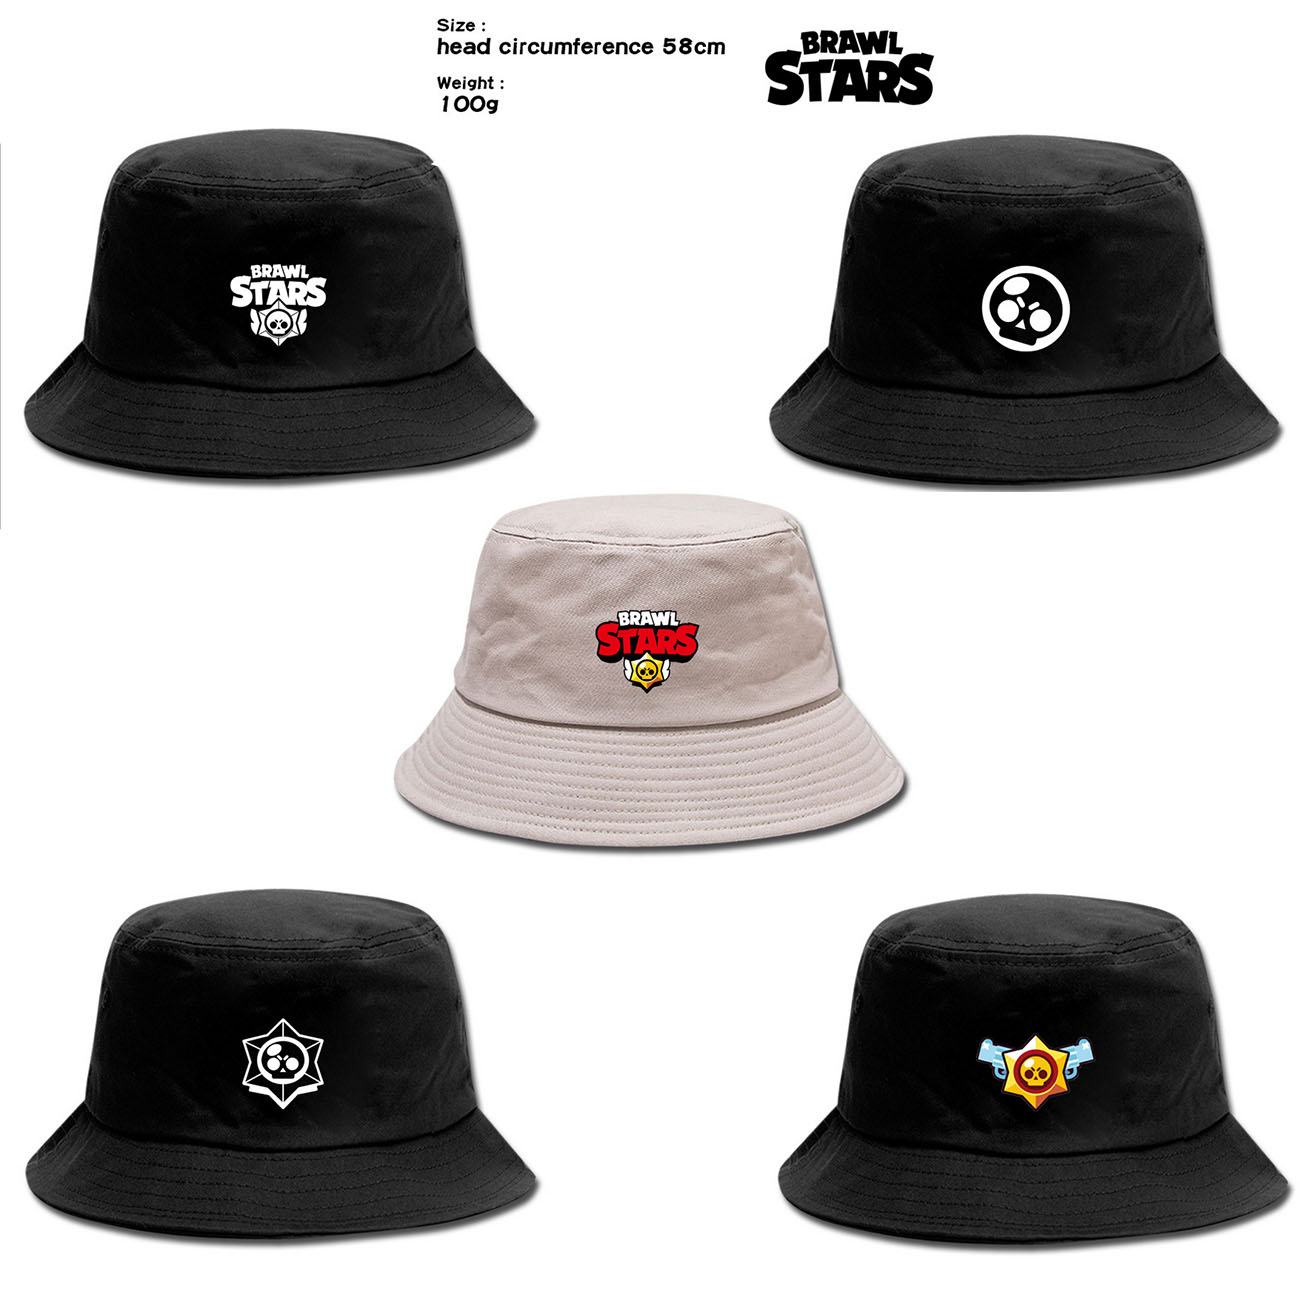 Brawling Game Stars Hat Toys Unisex Bucket Hat Fisherman Caps Leisure Cartoon Embroidery Bob Caps Cotton Outdoor Beach Sun Hats